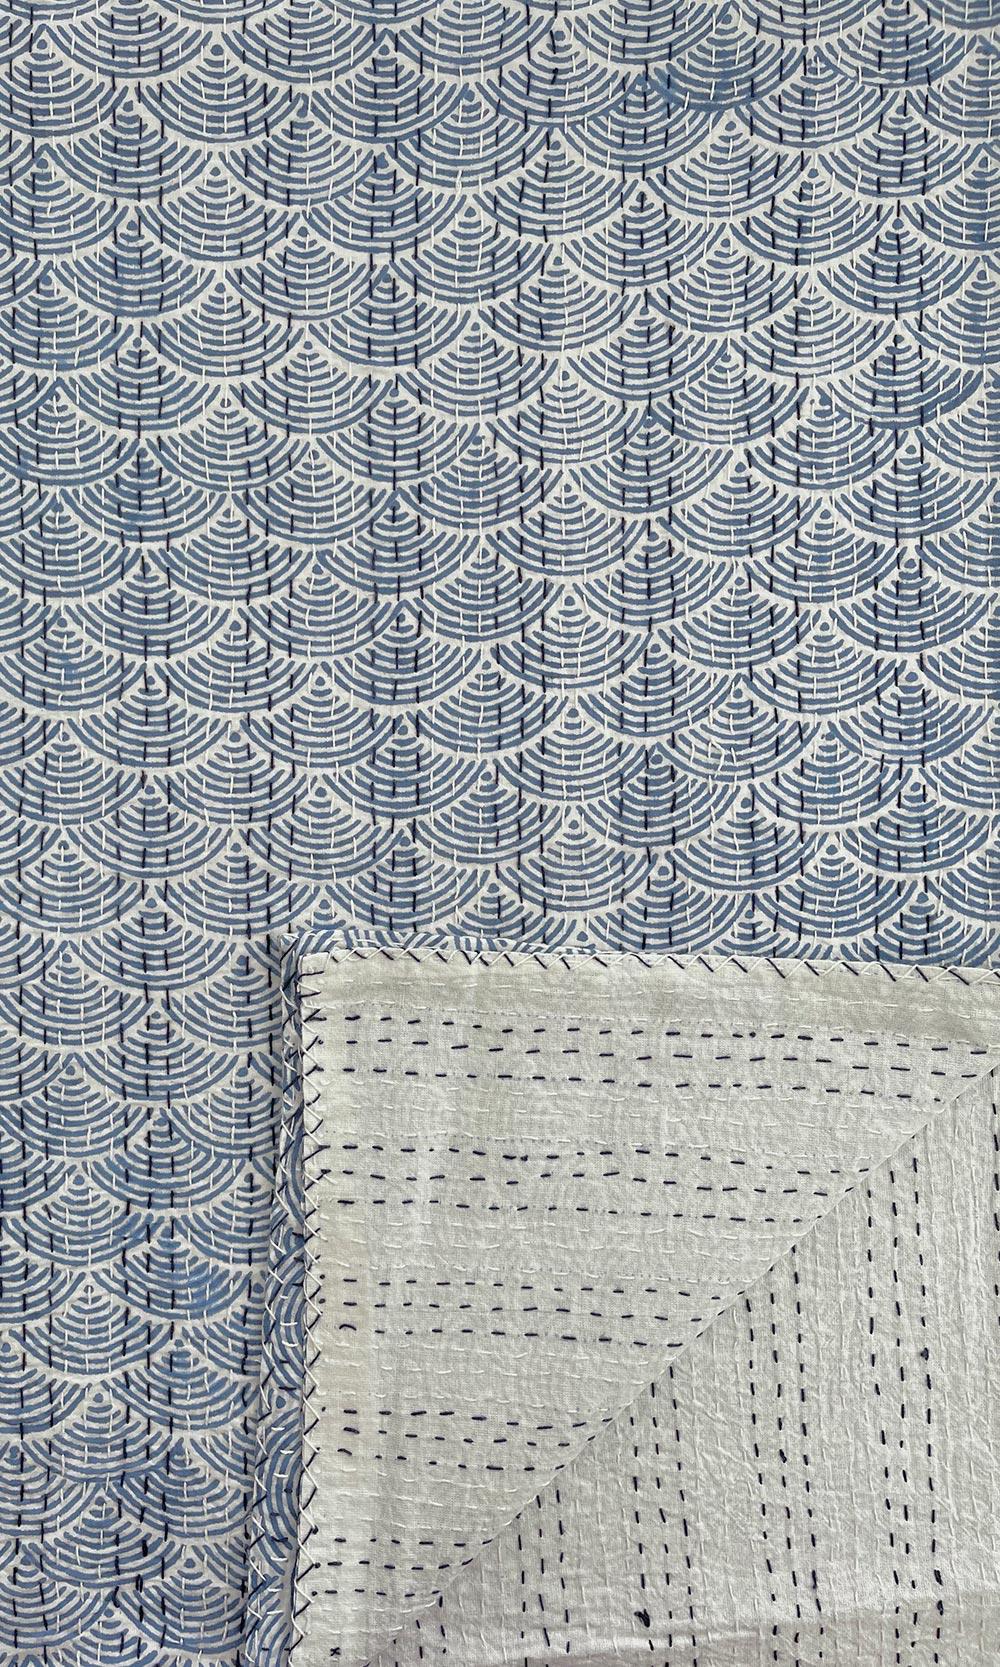 Blue & White Block Printed Reversible Cotton Kantha Throw